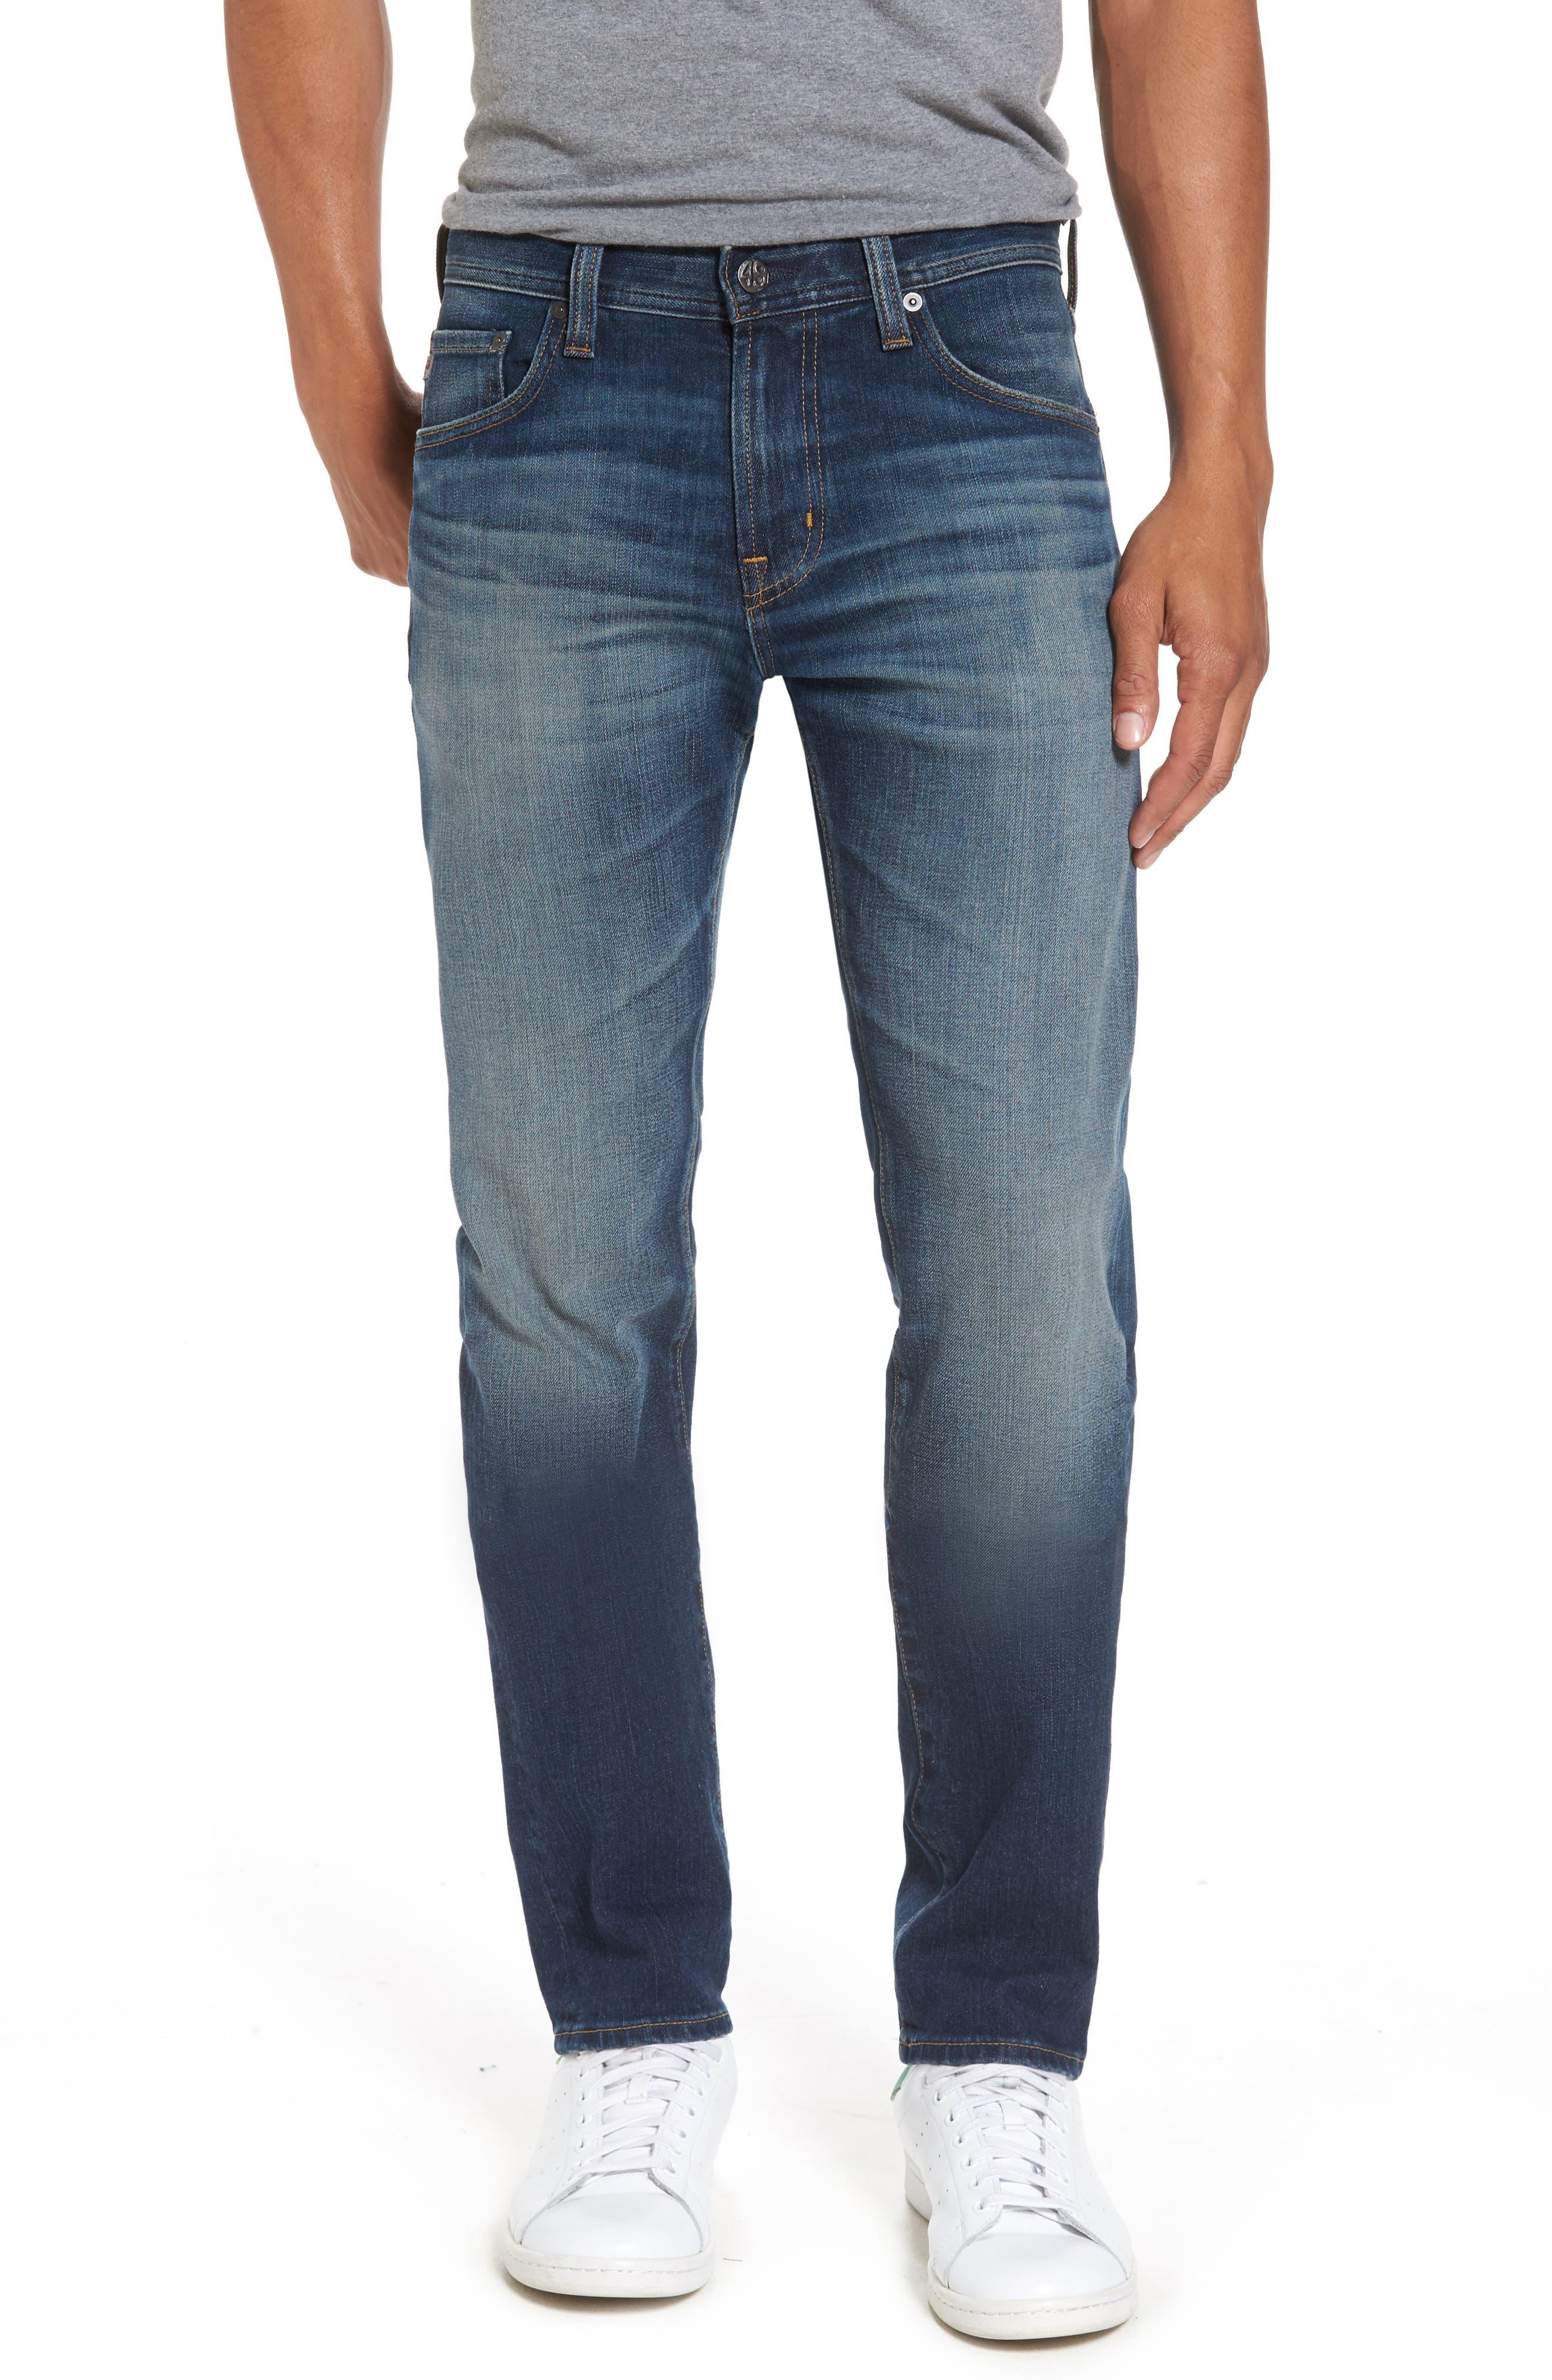 Alternate Image 1 Selected - AG Tellis Slim Fit Jeans (10 Years Shortcut)